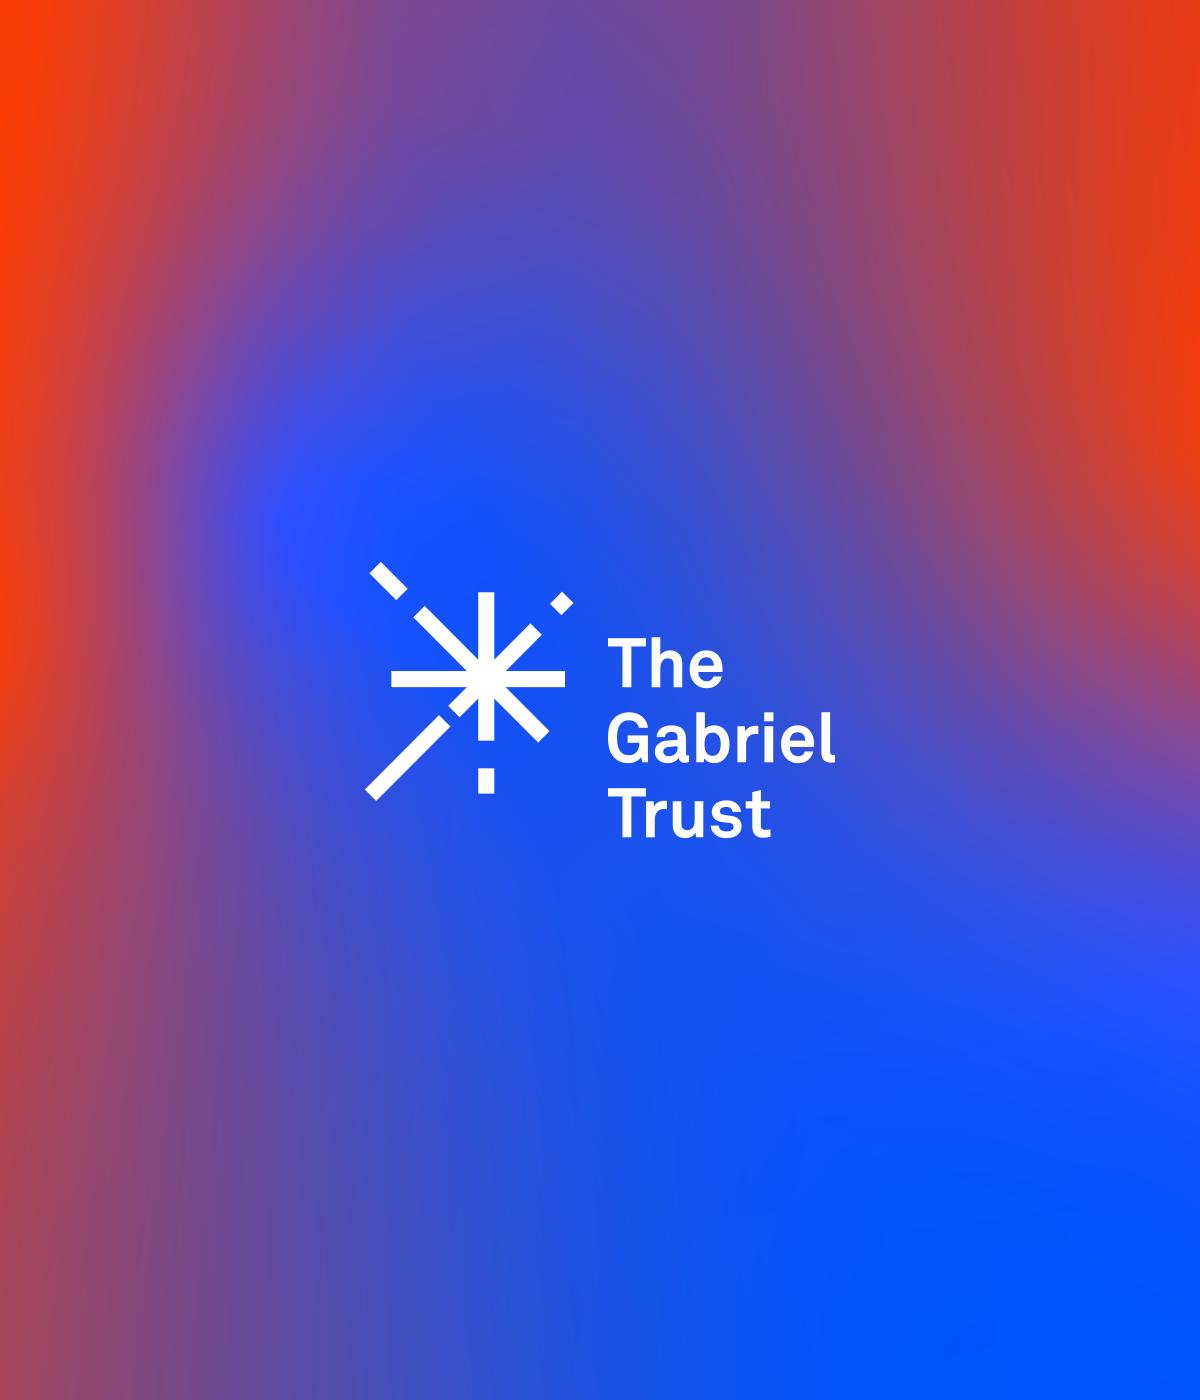 The Gabriel Trust